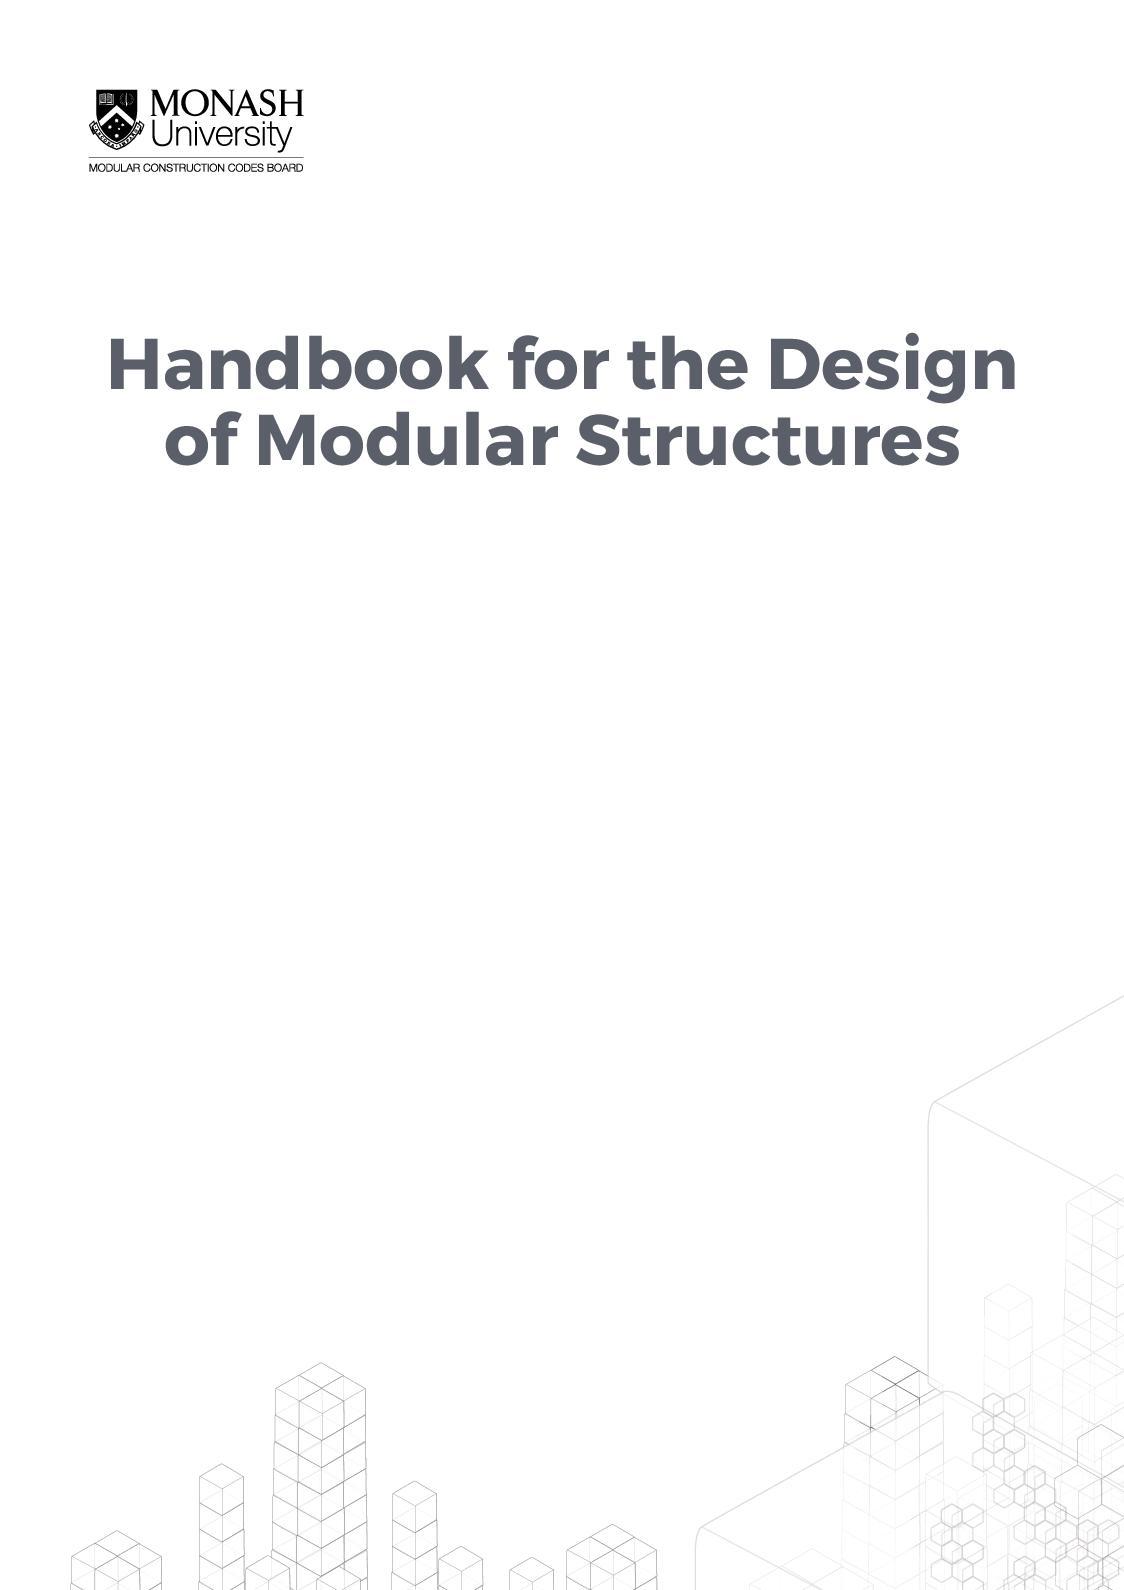 Handbook For The Design Of Modular Structures Calameo Downloader